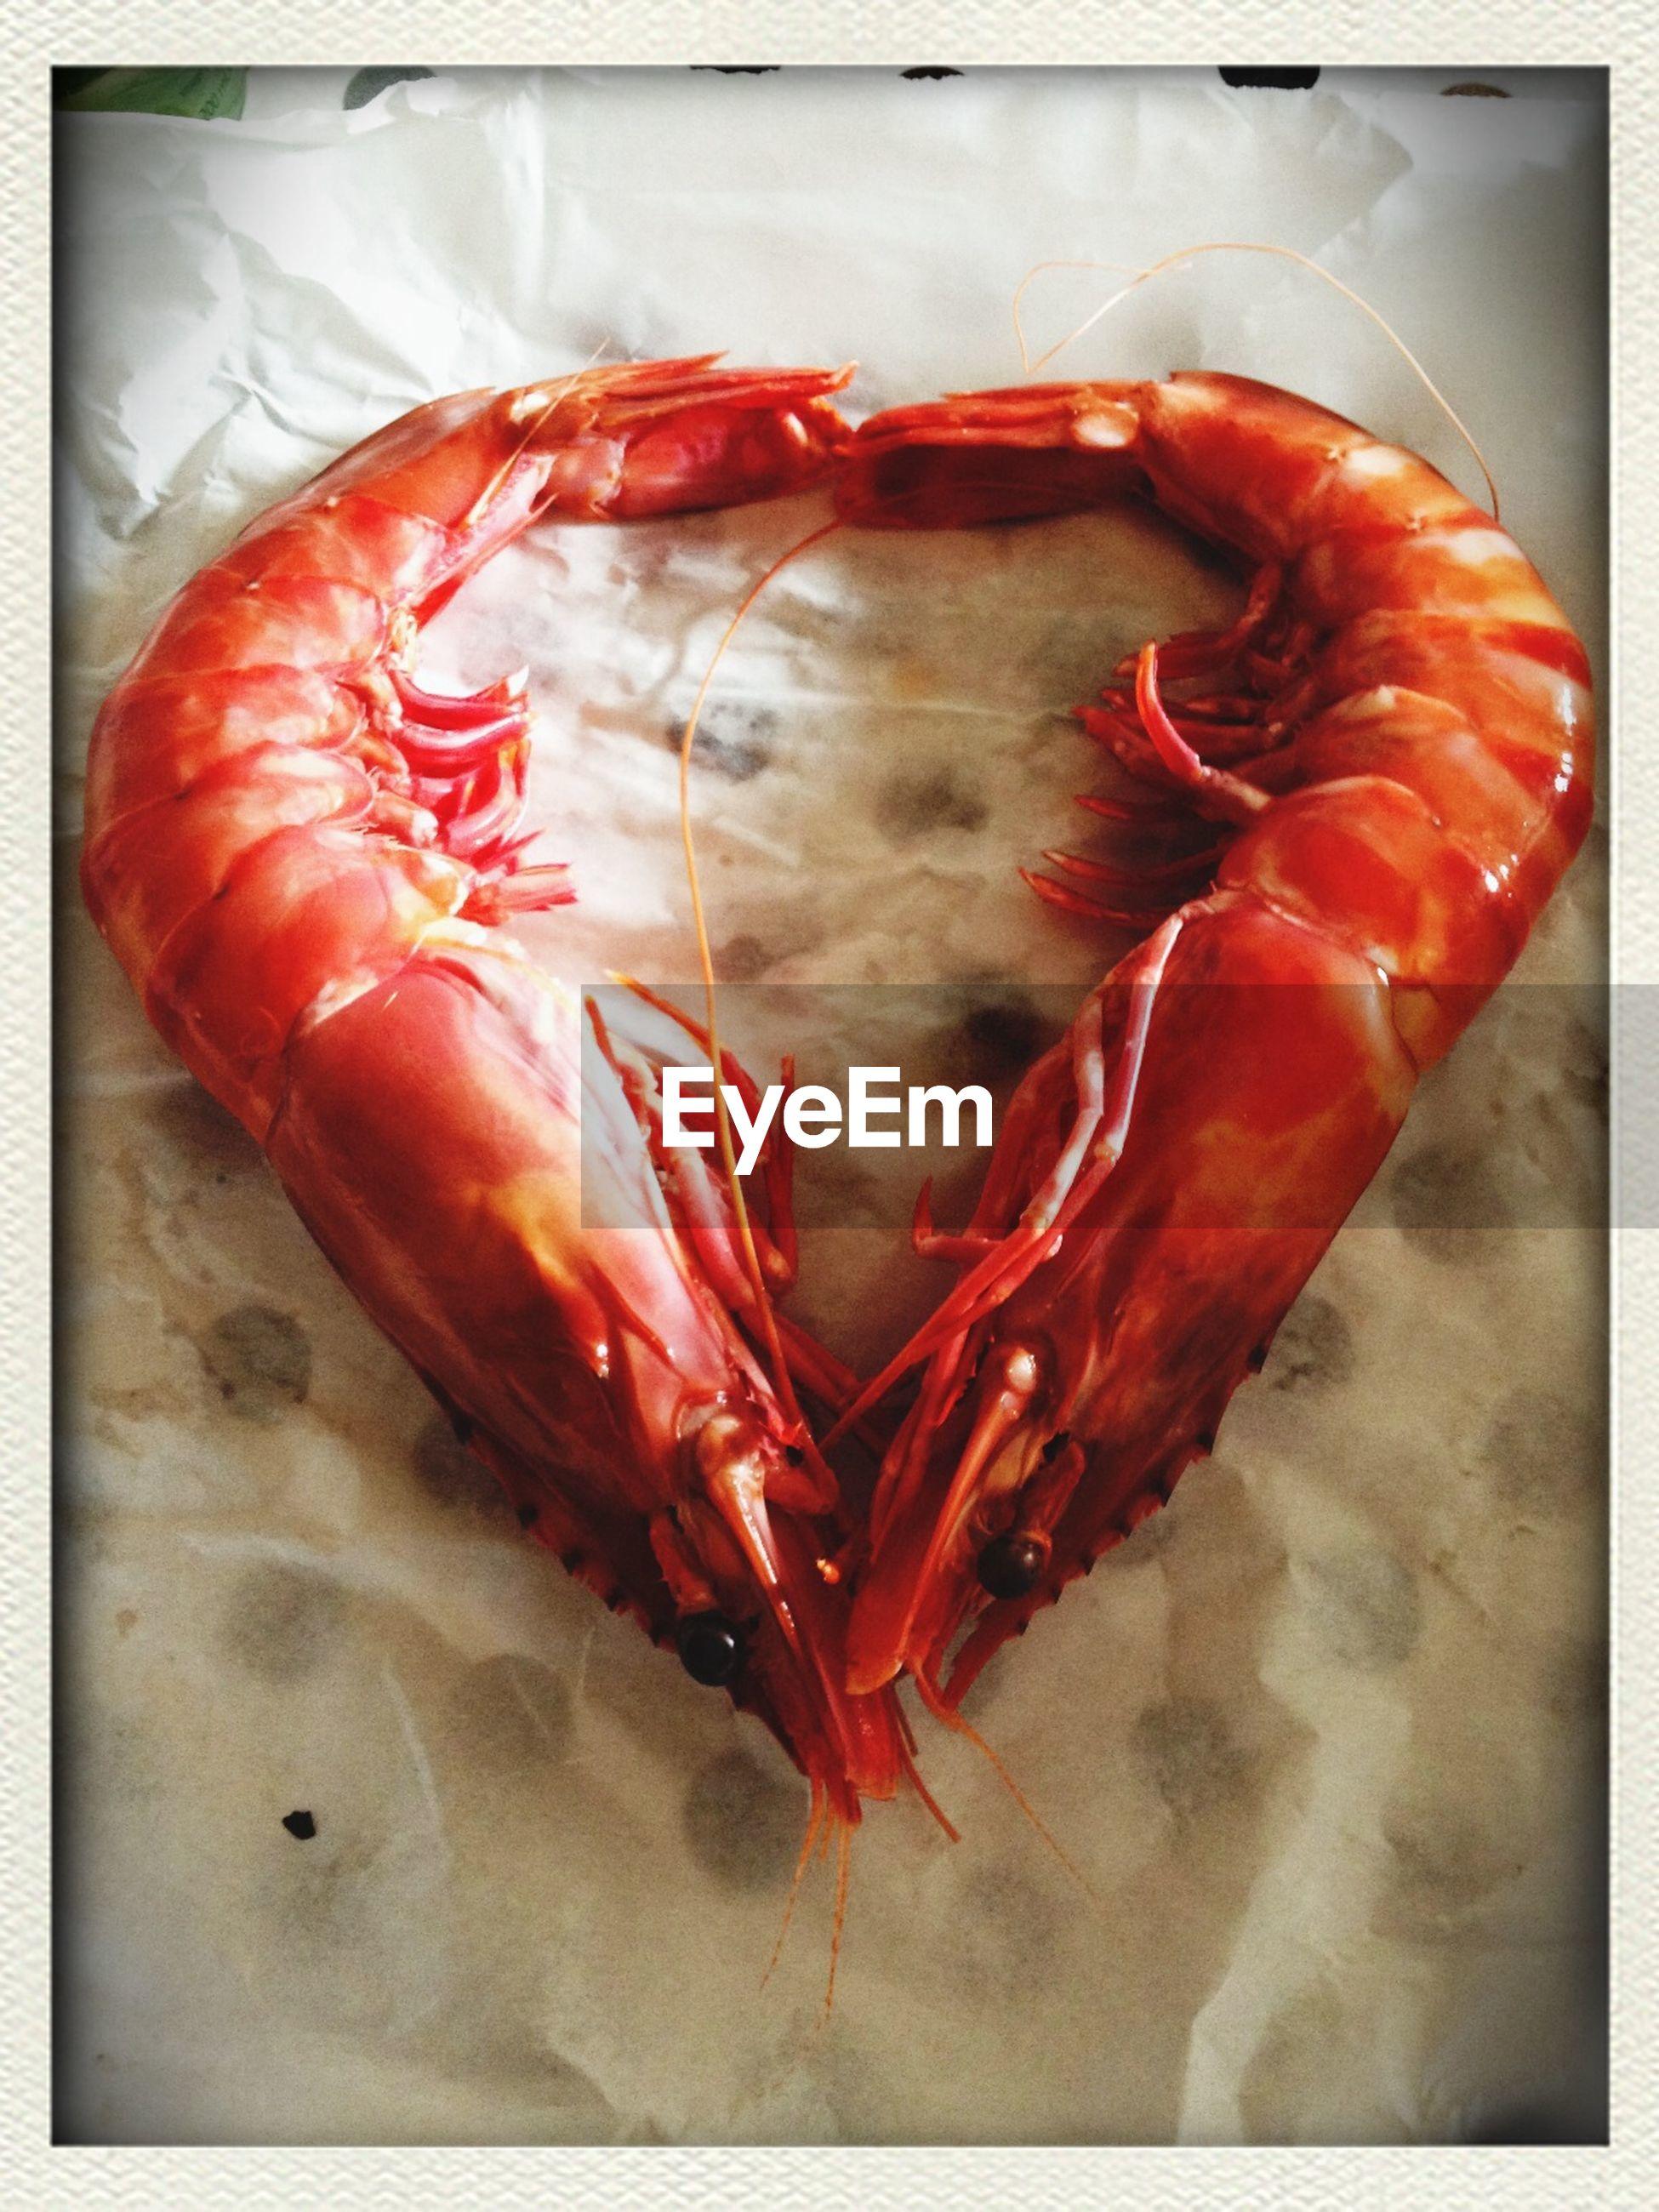 Two shrimps in heart shape